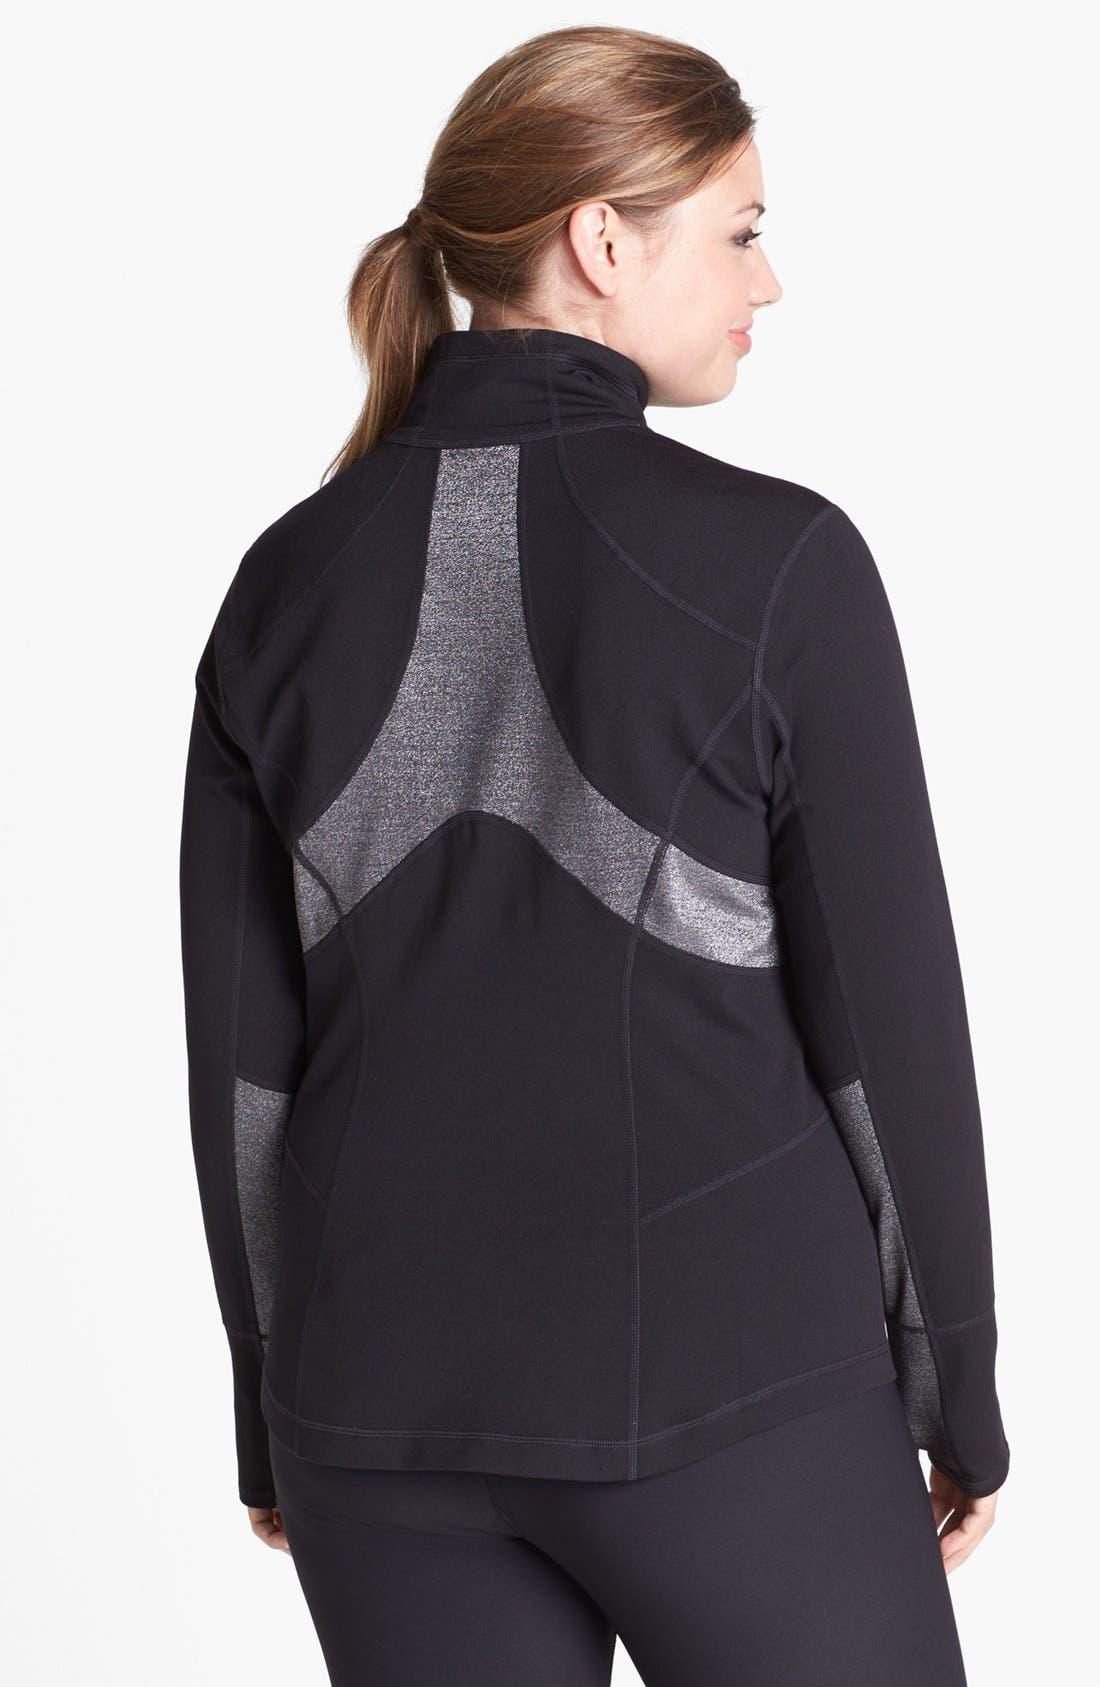 Main Image - Zella 'Luxe Mix' Jacket (Plus Size)